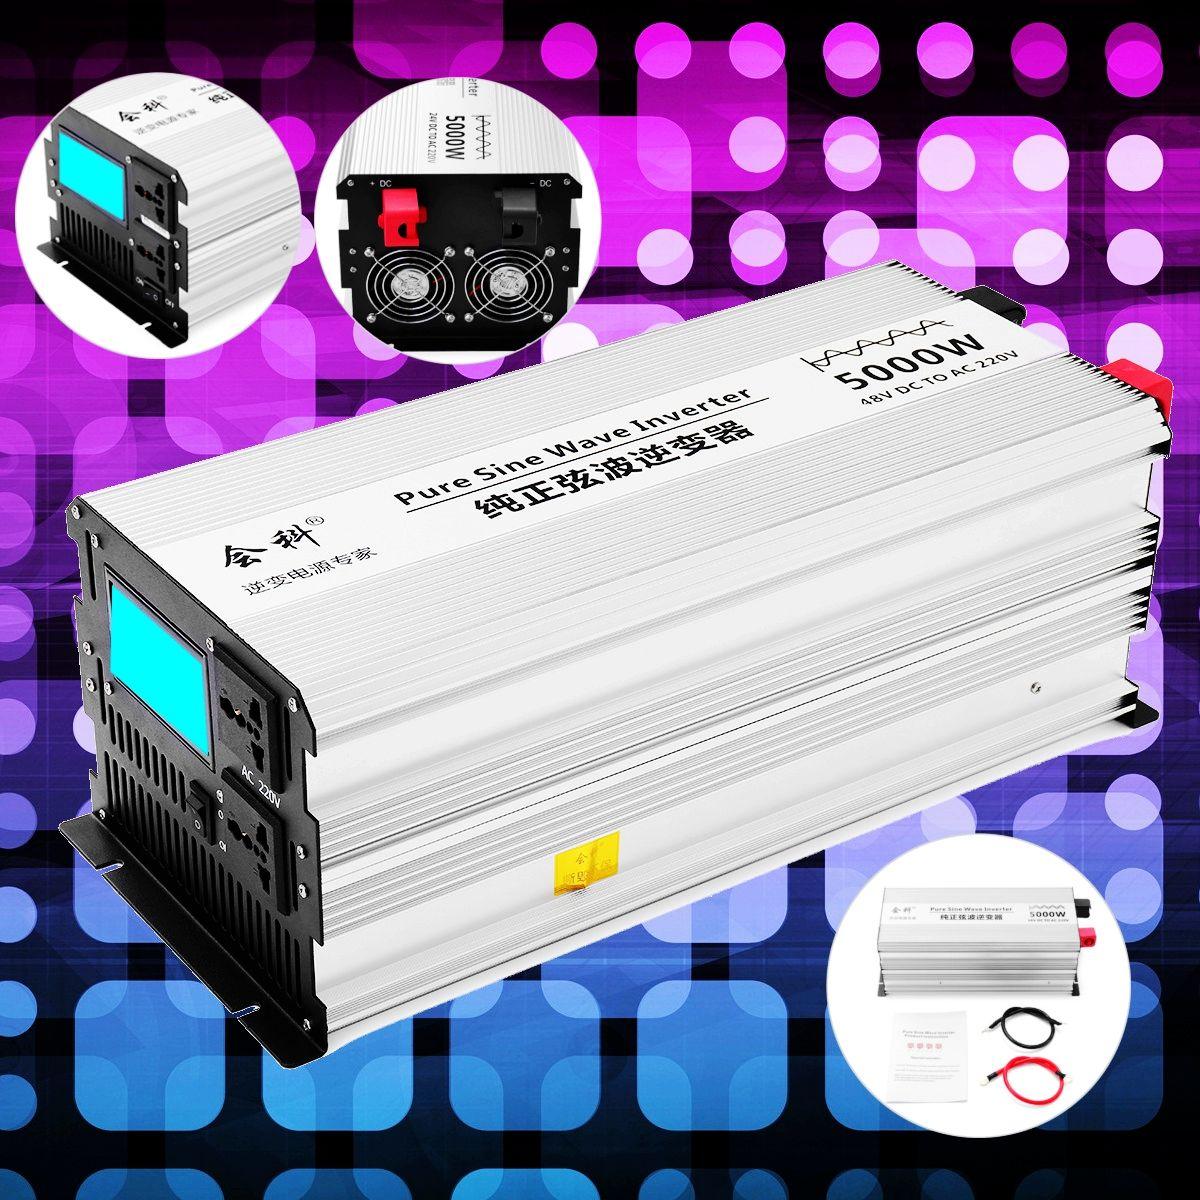 Inverter reine sinus welle 2500 watt 5000 watt P eak 50 hz DC 12 v/24 v/48 v zu AC 110 v/220 v Spannung Transformator Converte LCD display Inverter